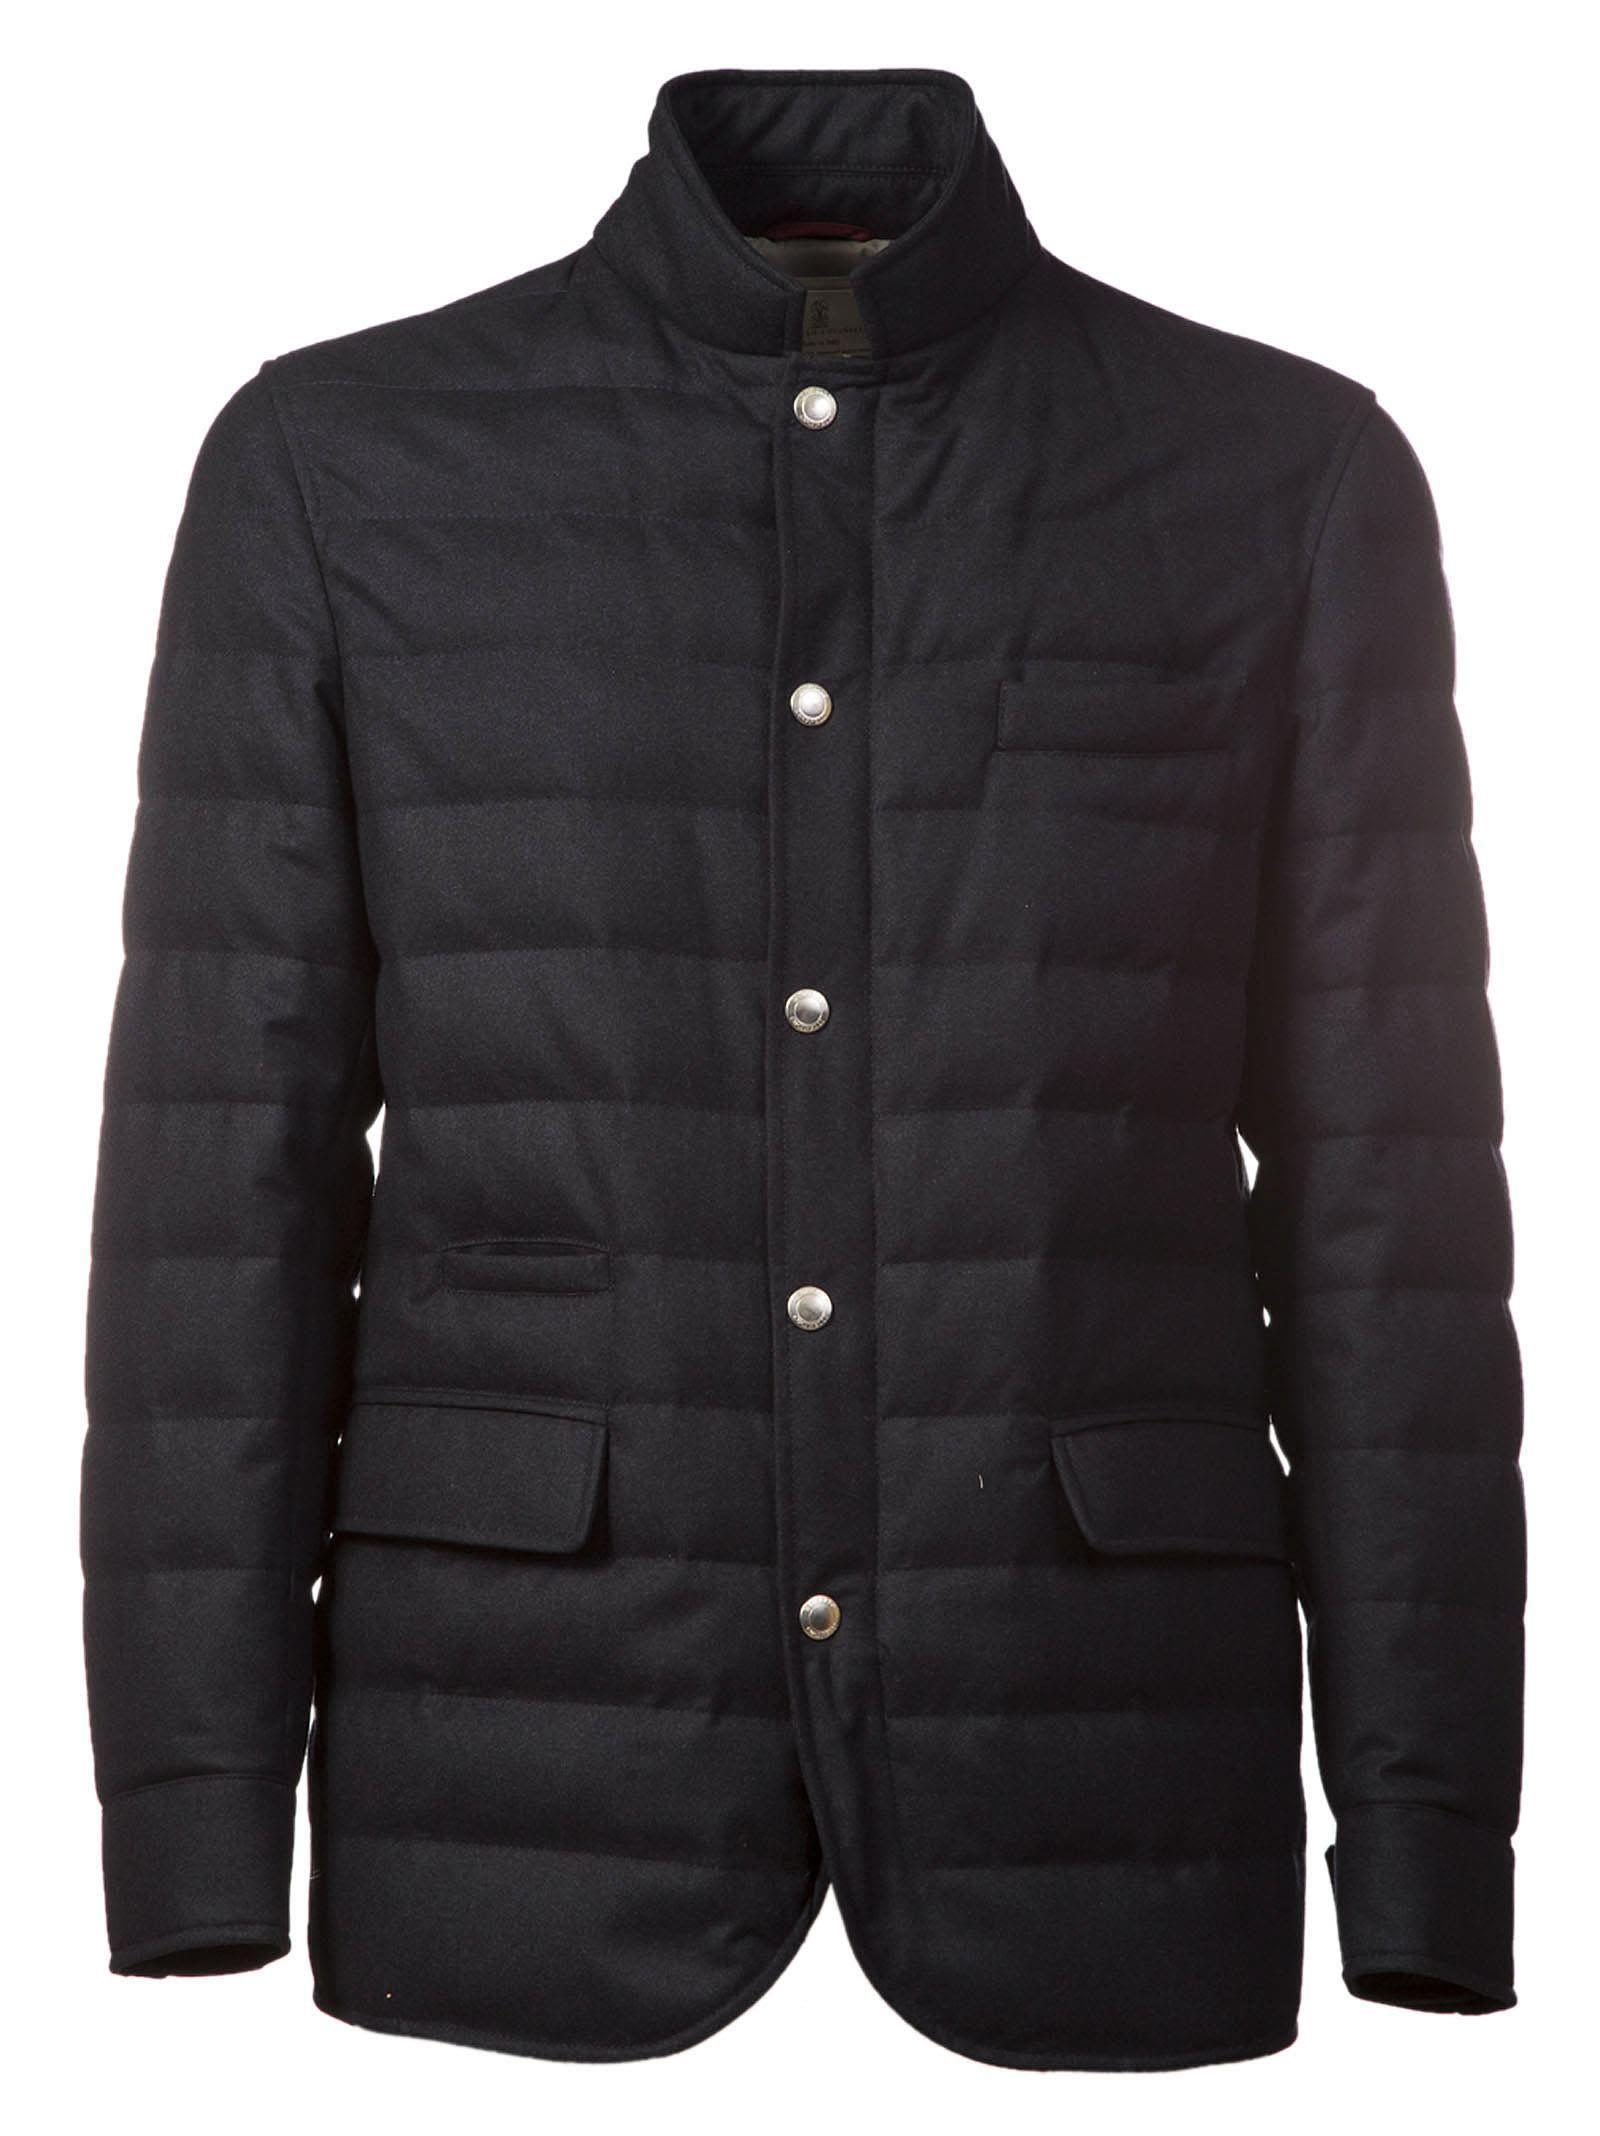 Brunello Cucinelli Padded Shirt Jacket In Bluette Modesens Leather Jacket With Hood Shirt Jacket Jackets